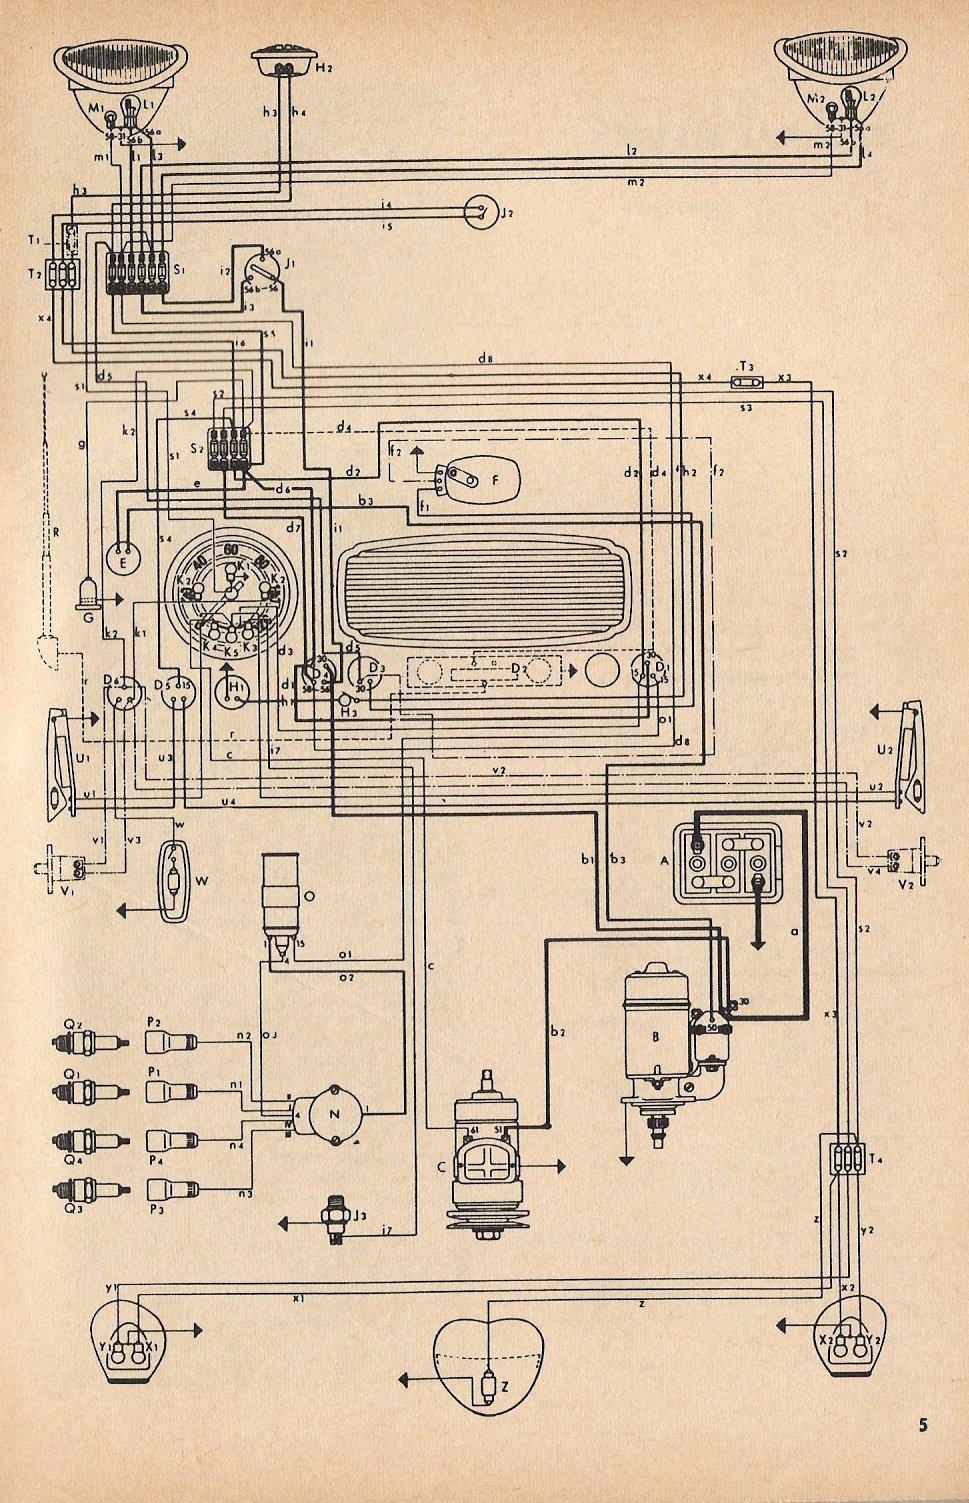 hight resolution of 71 vw super beetle wiring diagram type 3 get free image 1968 vw dash wiring vw dune buggy wiring schematic